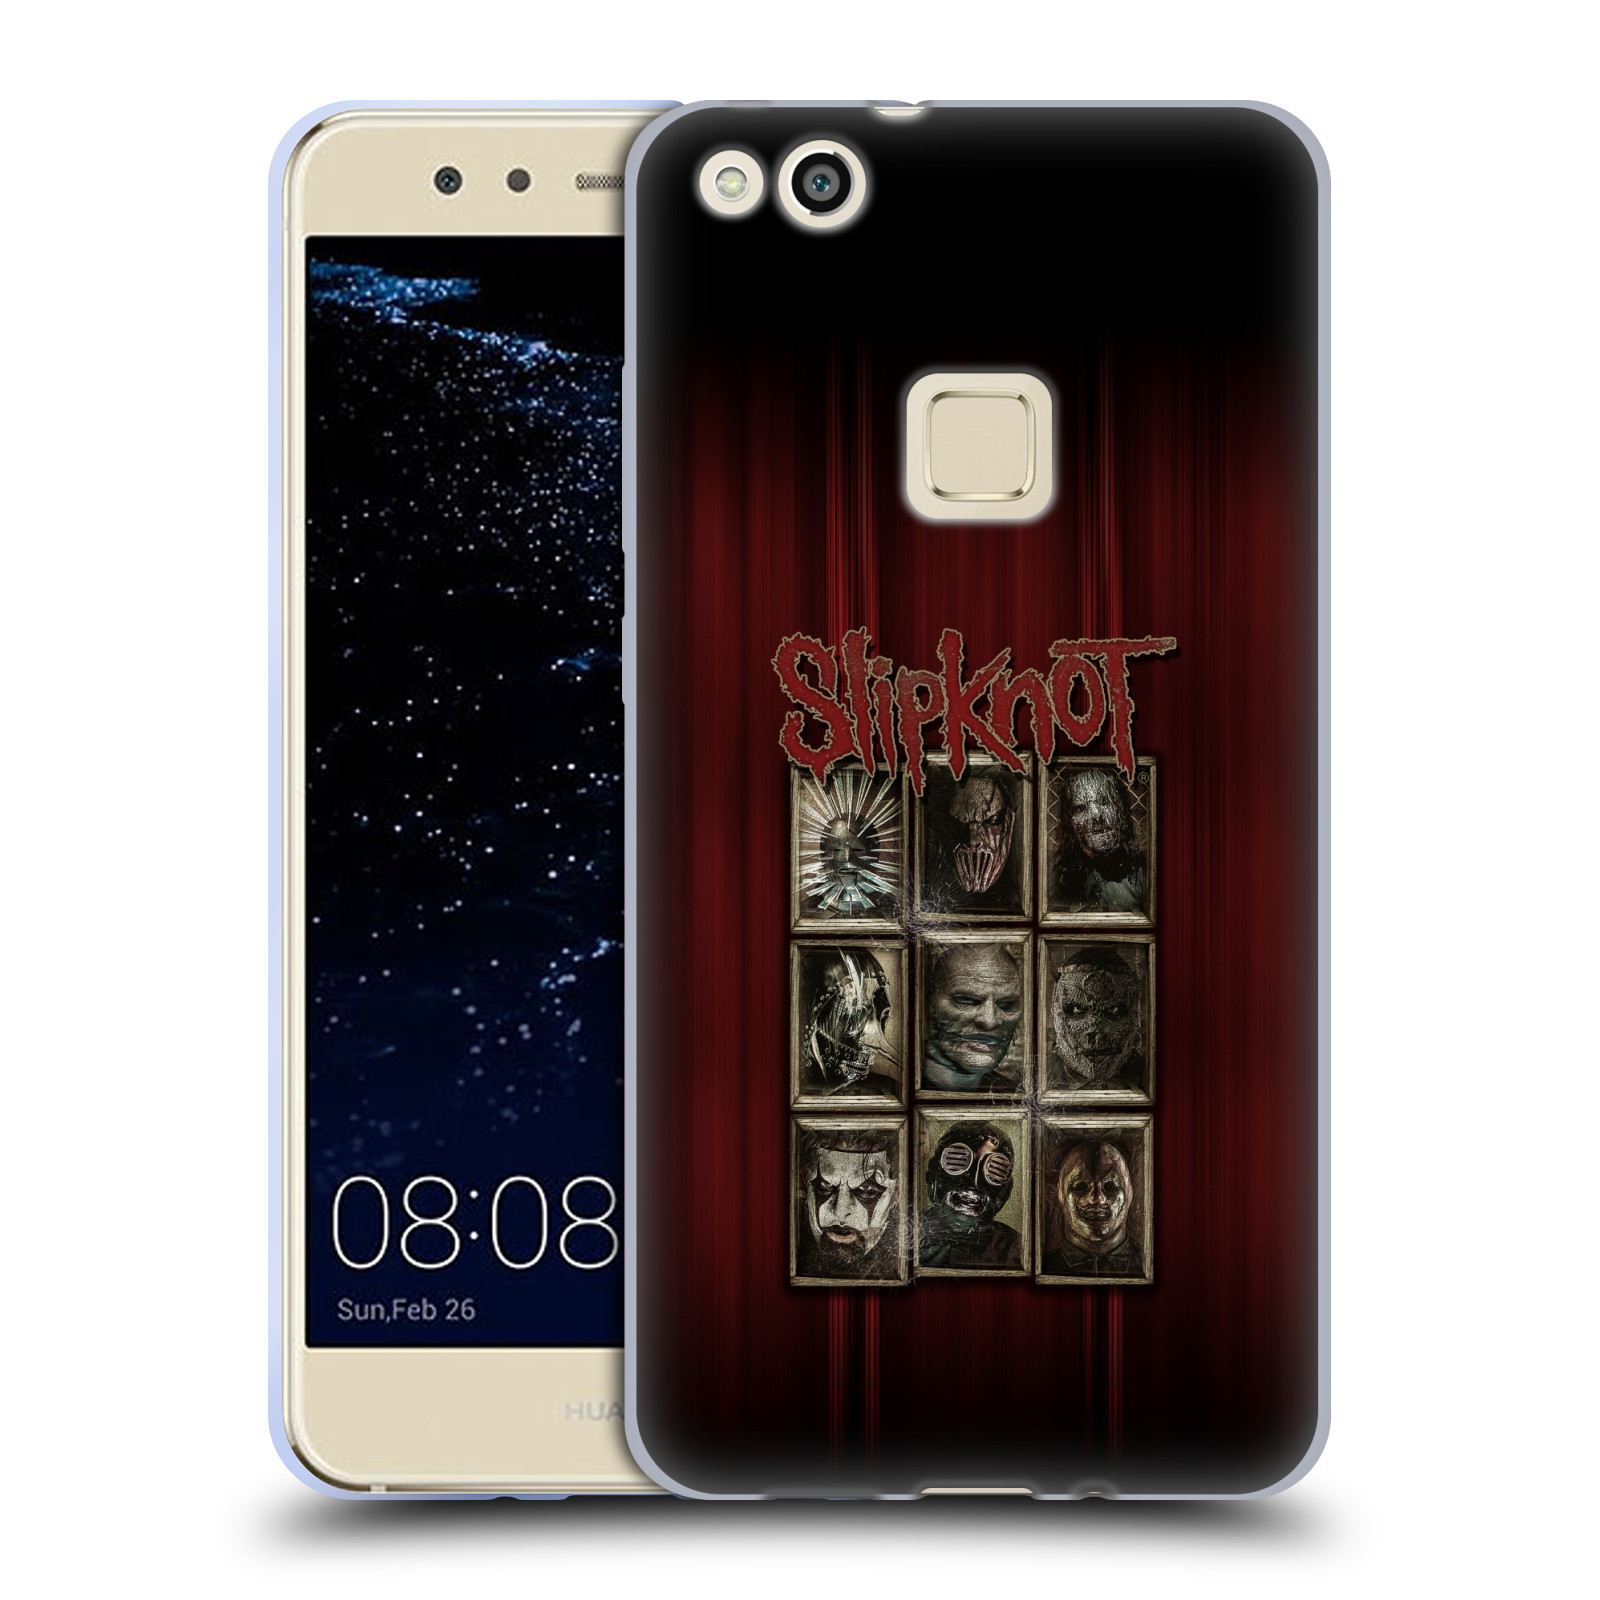 Silikonové pouzdro na mobil Huawei P10 Lite Head Case - Slipknot - Masky (Silikonový kryt či obal na mobilní telefon licencovaným motivem Slipknot pro Huawei P10 Lite Dual SIM (LX1/LX1A))